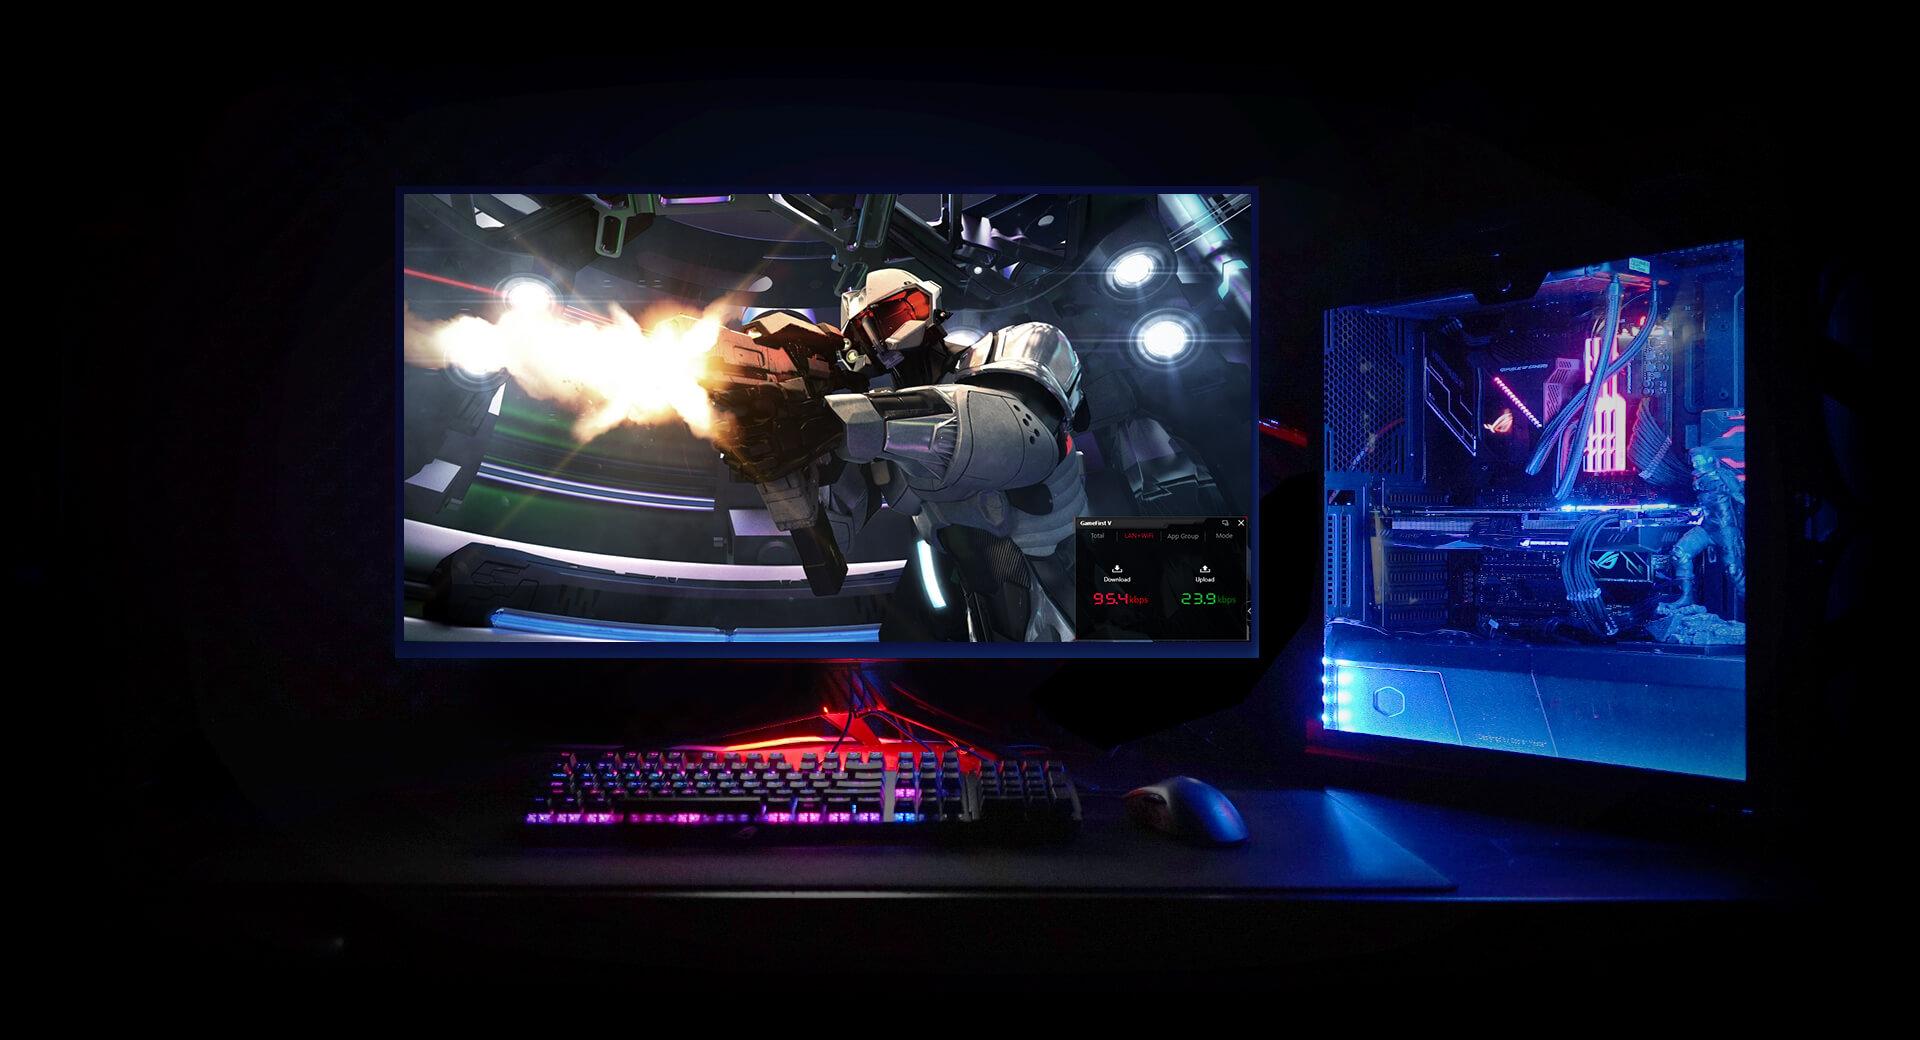 ASUS ROG MAXIMUS XI HERO (WI-FI) | Gaming Motherboard | ASUS USA